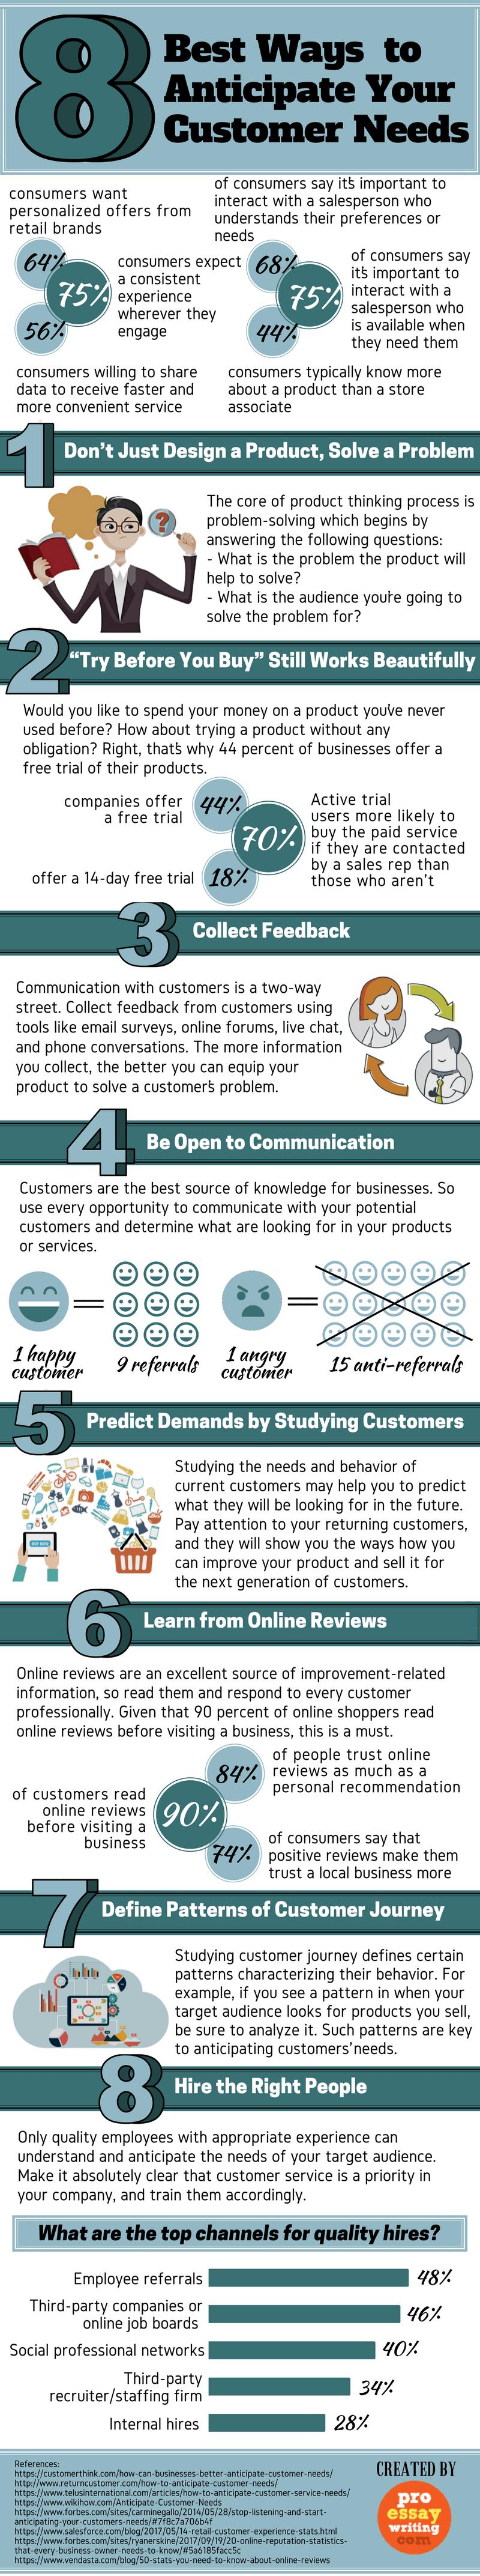 Best Ways to Anticipate Your Customer Needs (1)